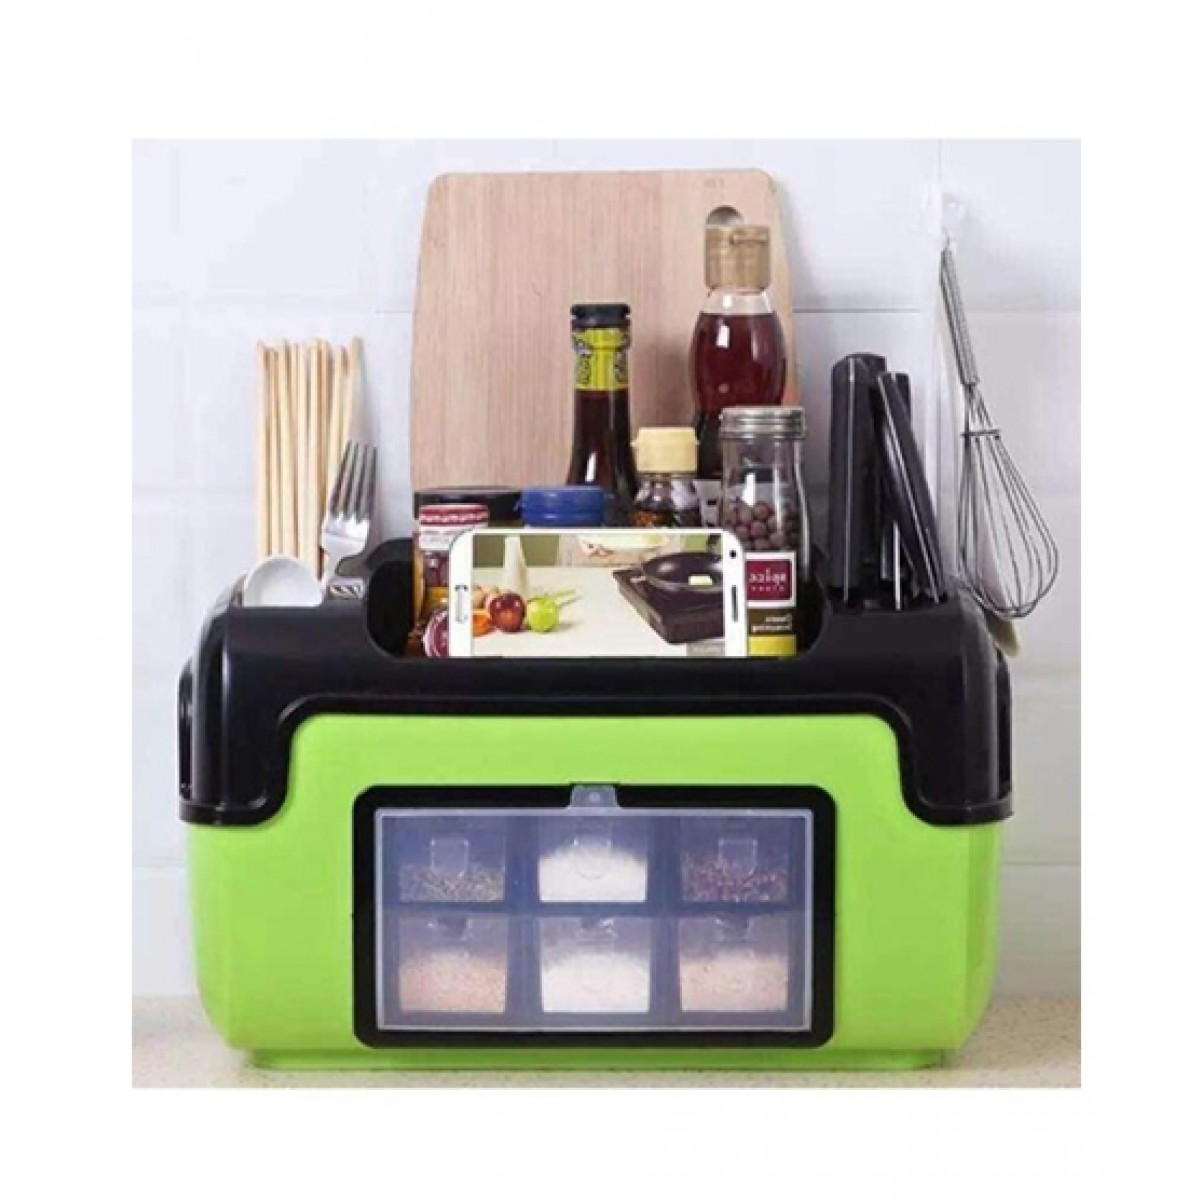 Mart89 Spice & Cutlery Organizer - Green